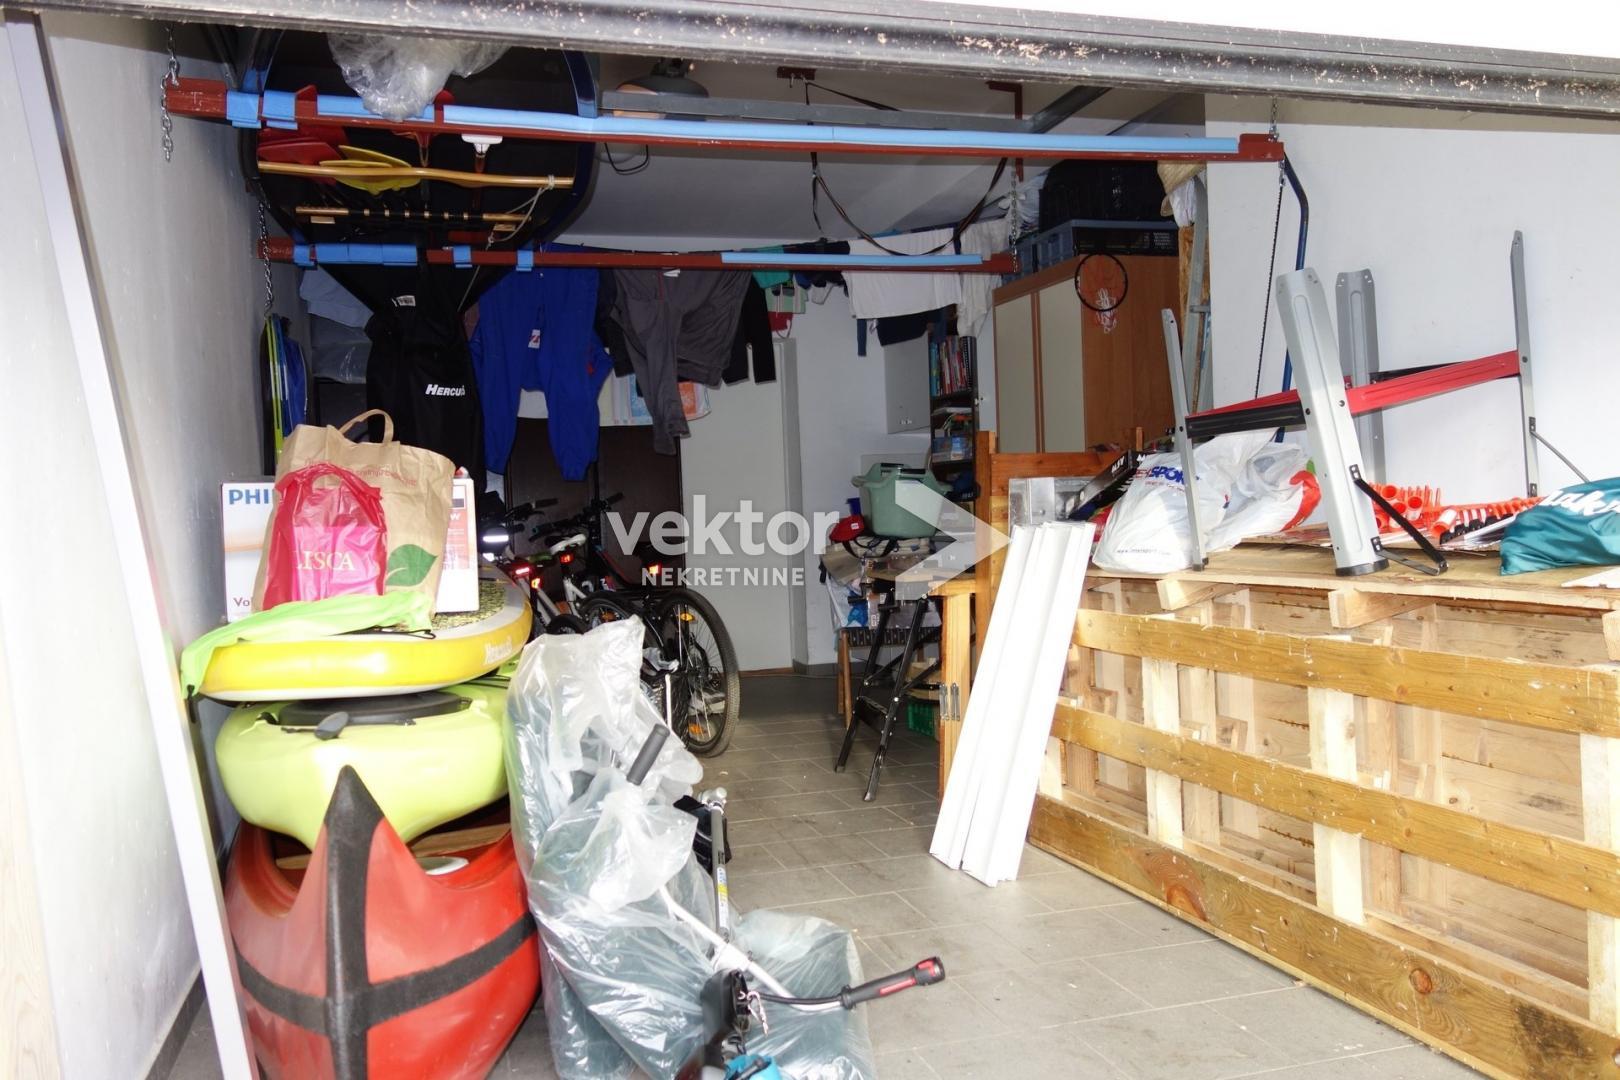 Stan, Zamet, 74m2, 2s+db, garaža, novogradnja